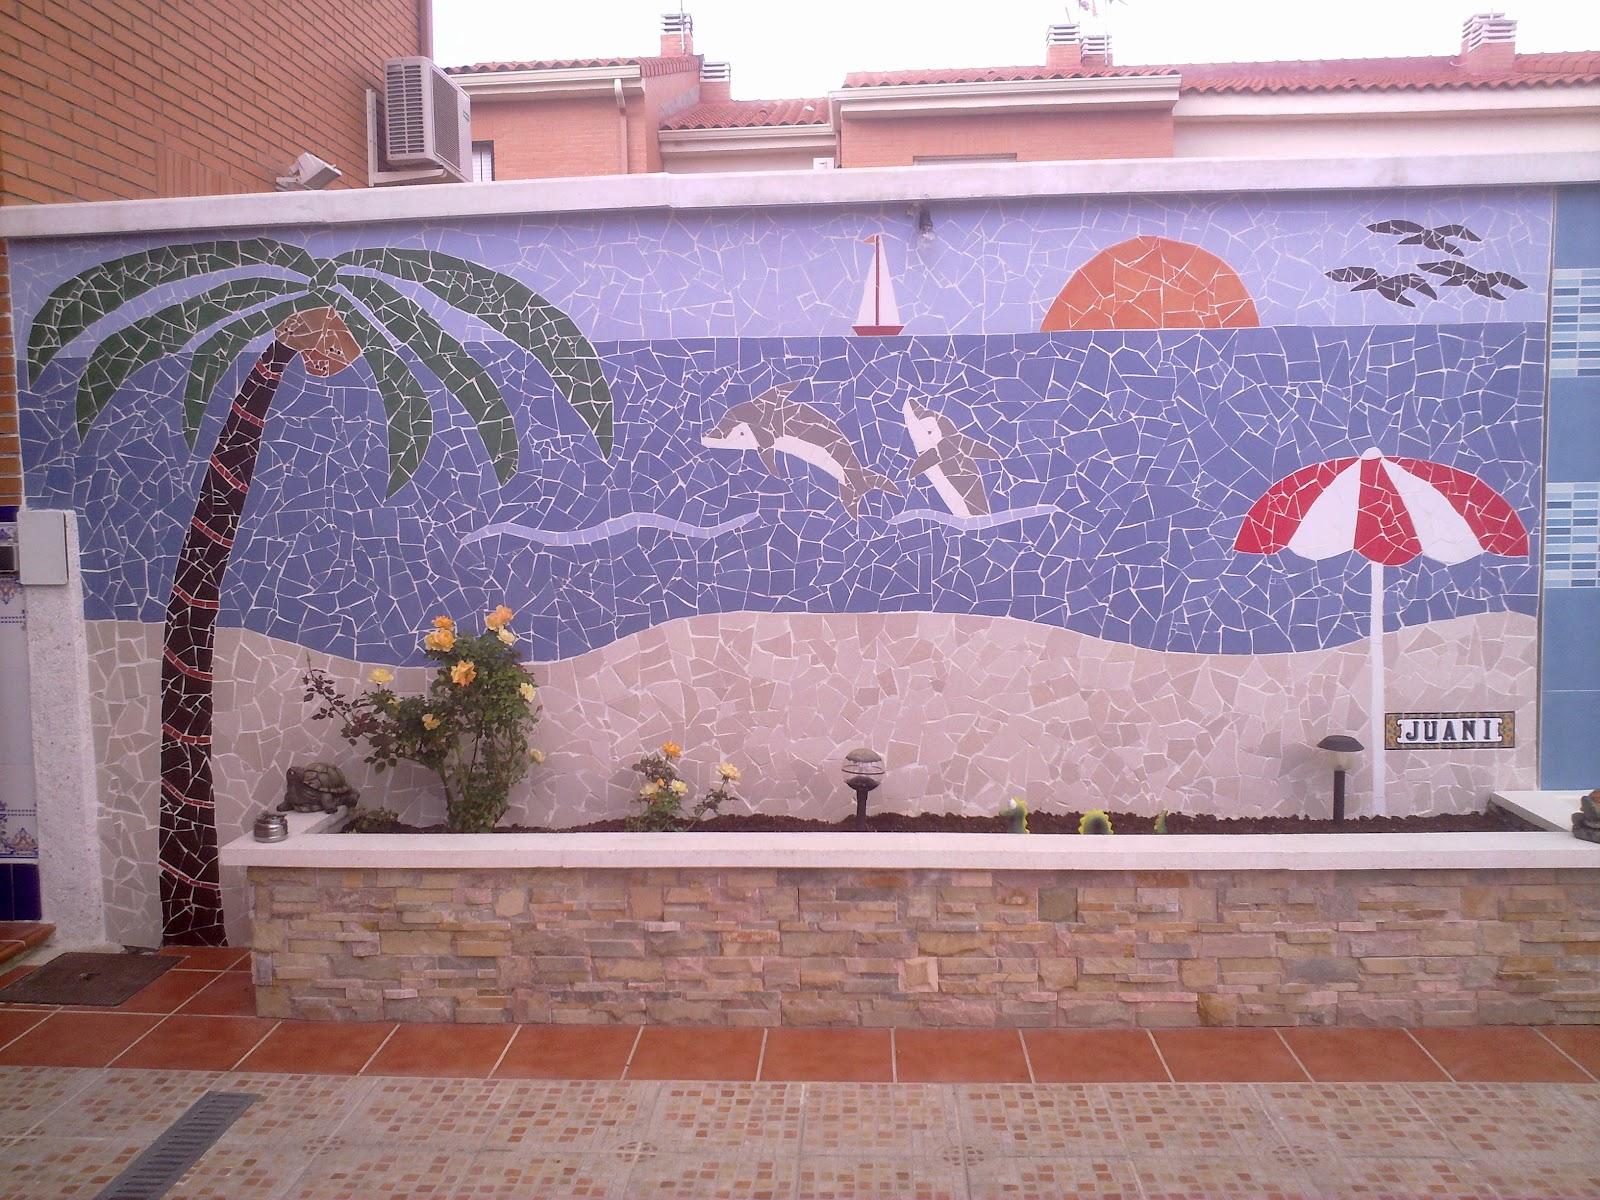 Juani manualidades mosaico de azulejos rotos - Azulejos para mosaicos ...